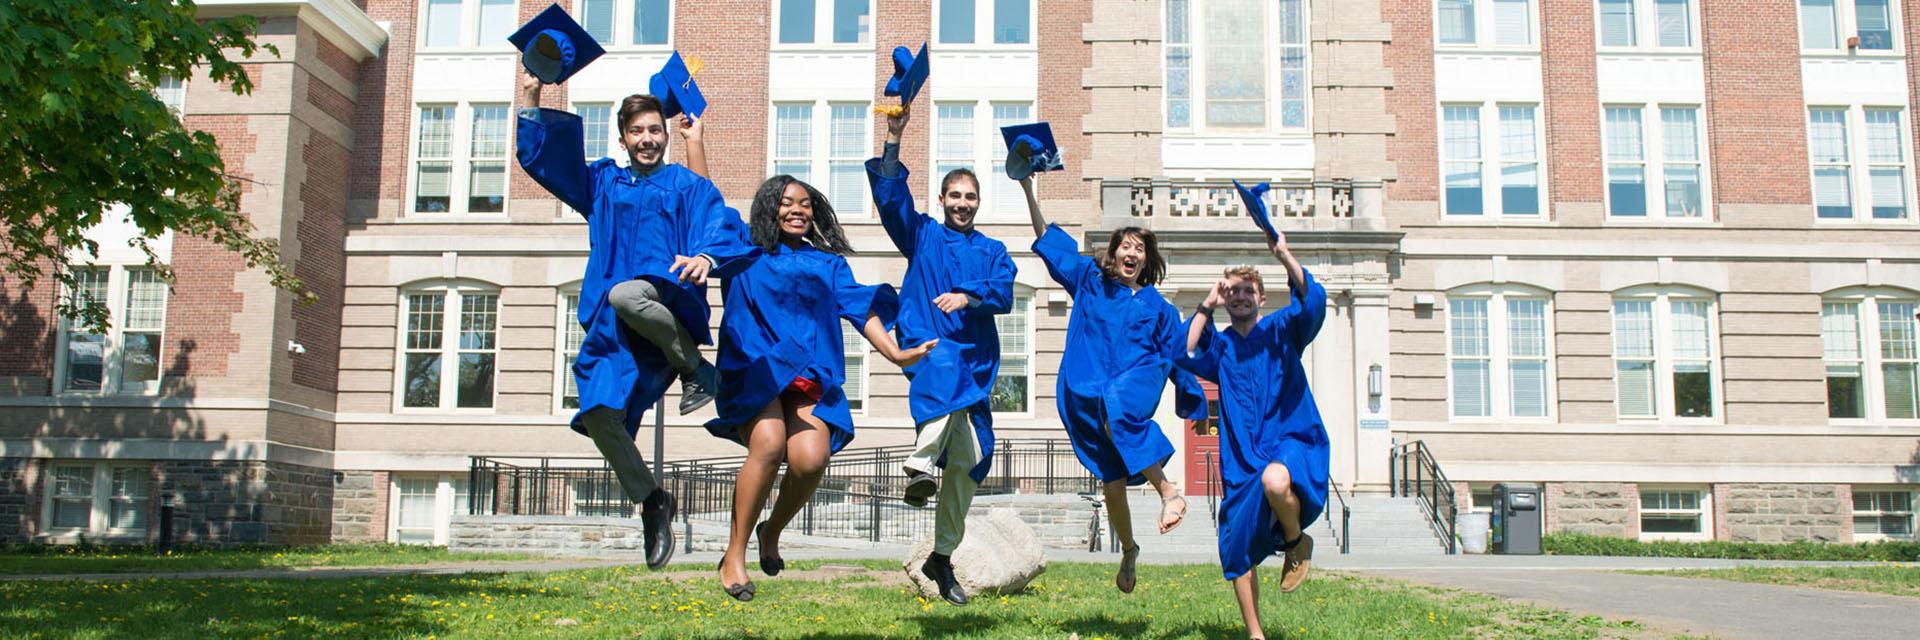 Suny New Paltz Graduation 2020.Suny New Paltz Commencement